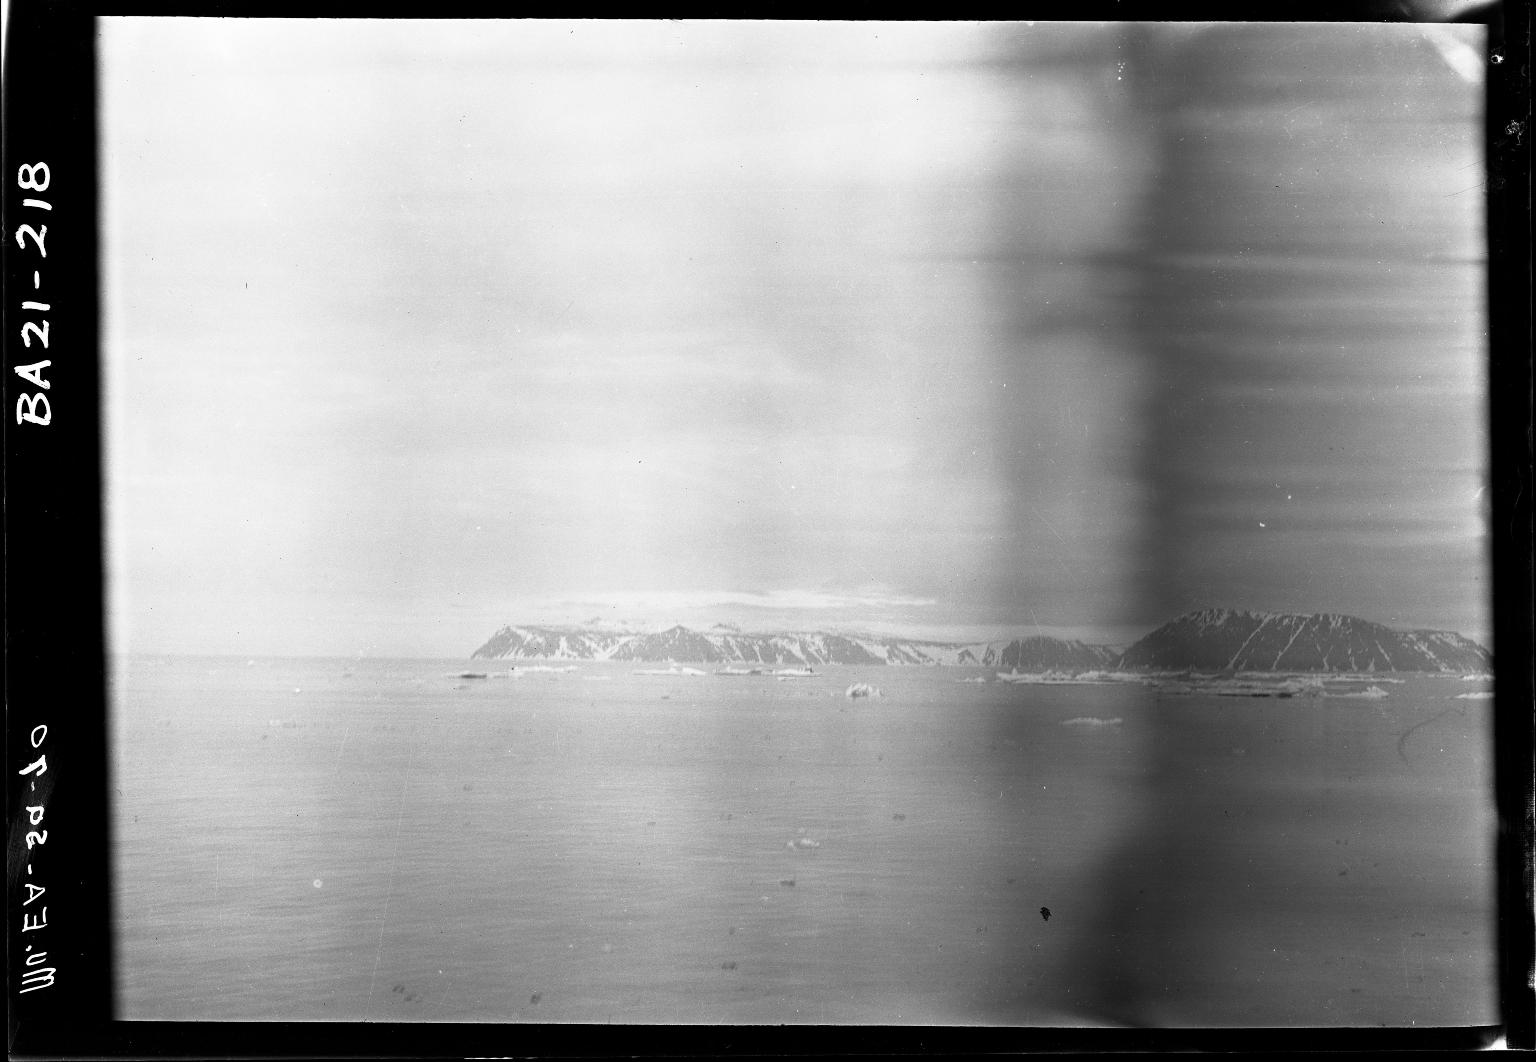 Little Diomede Island